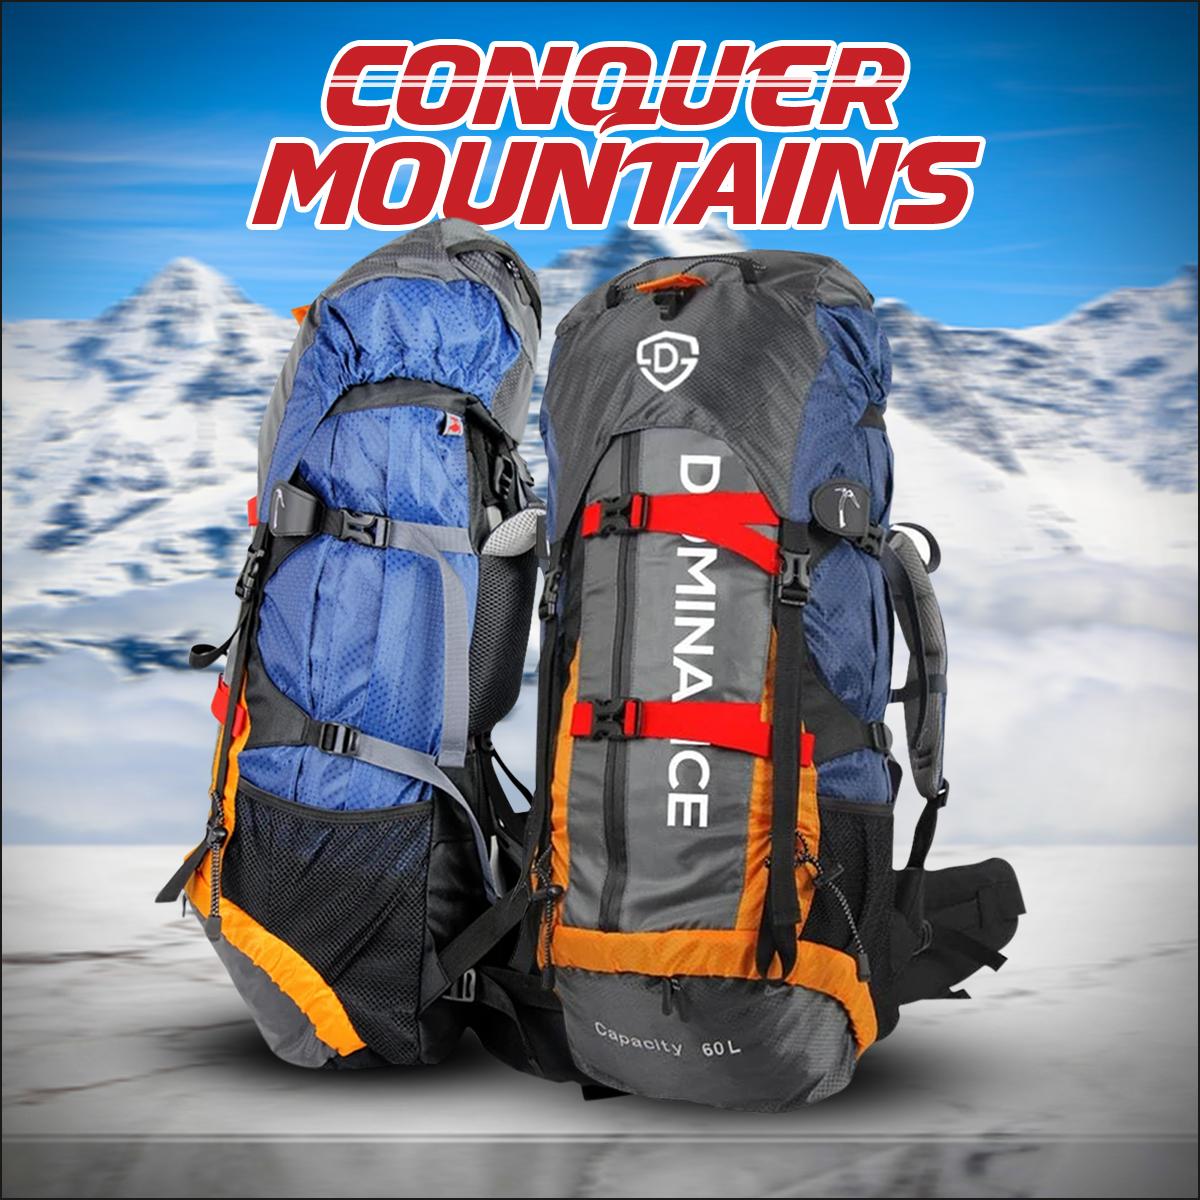 Men Travel Backpack 60 Liter Camping Backpack for Outdoor Hiking